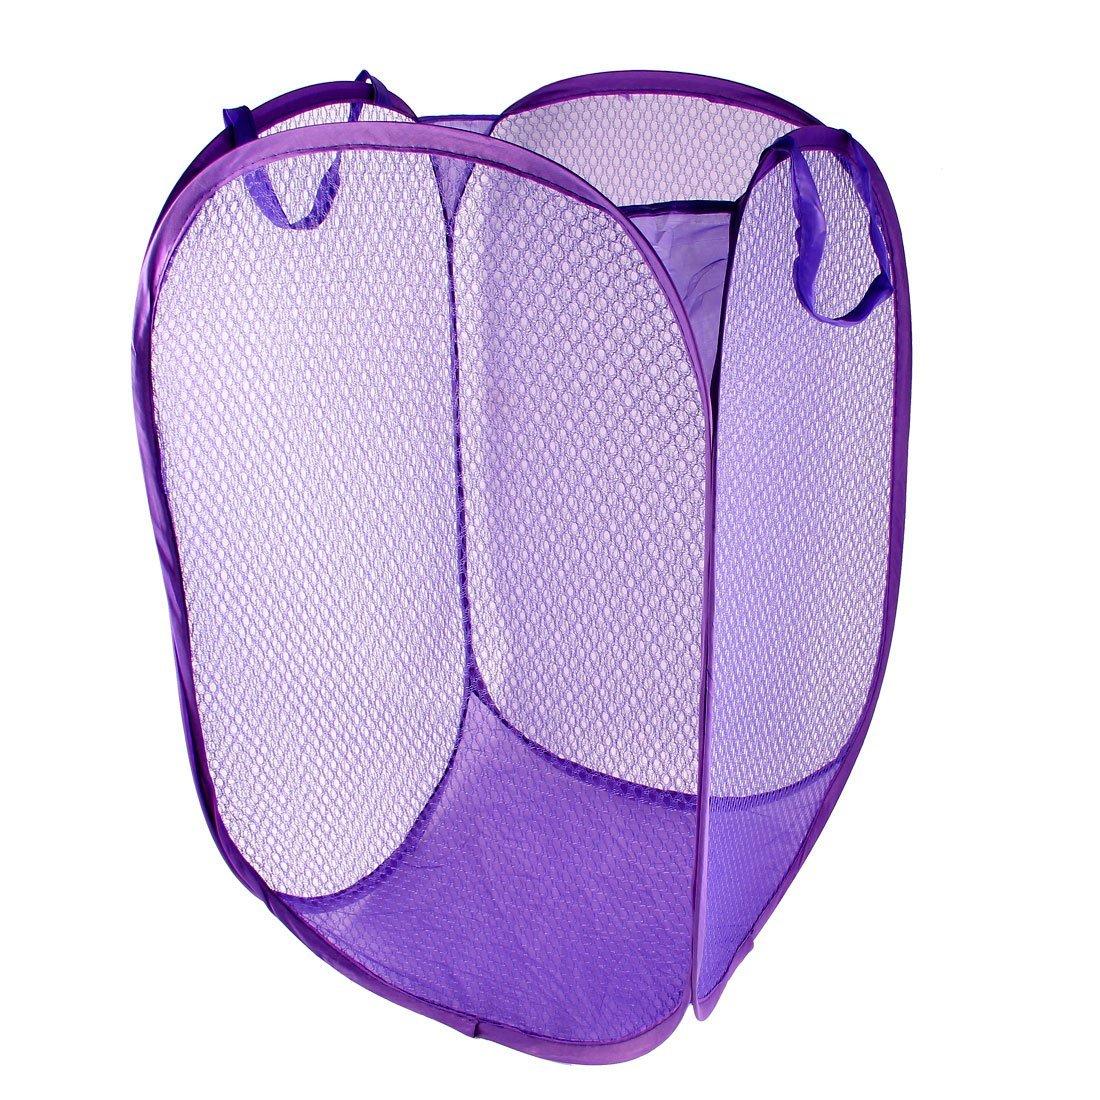 Laundry Bag Basket Pop Up Hamper Foldable Clothes Storage Bin Purple